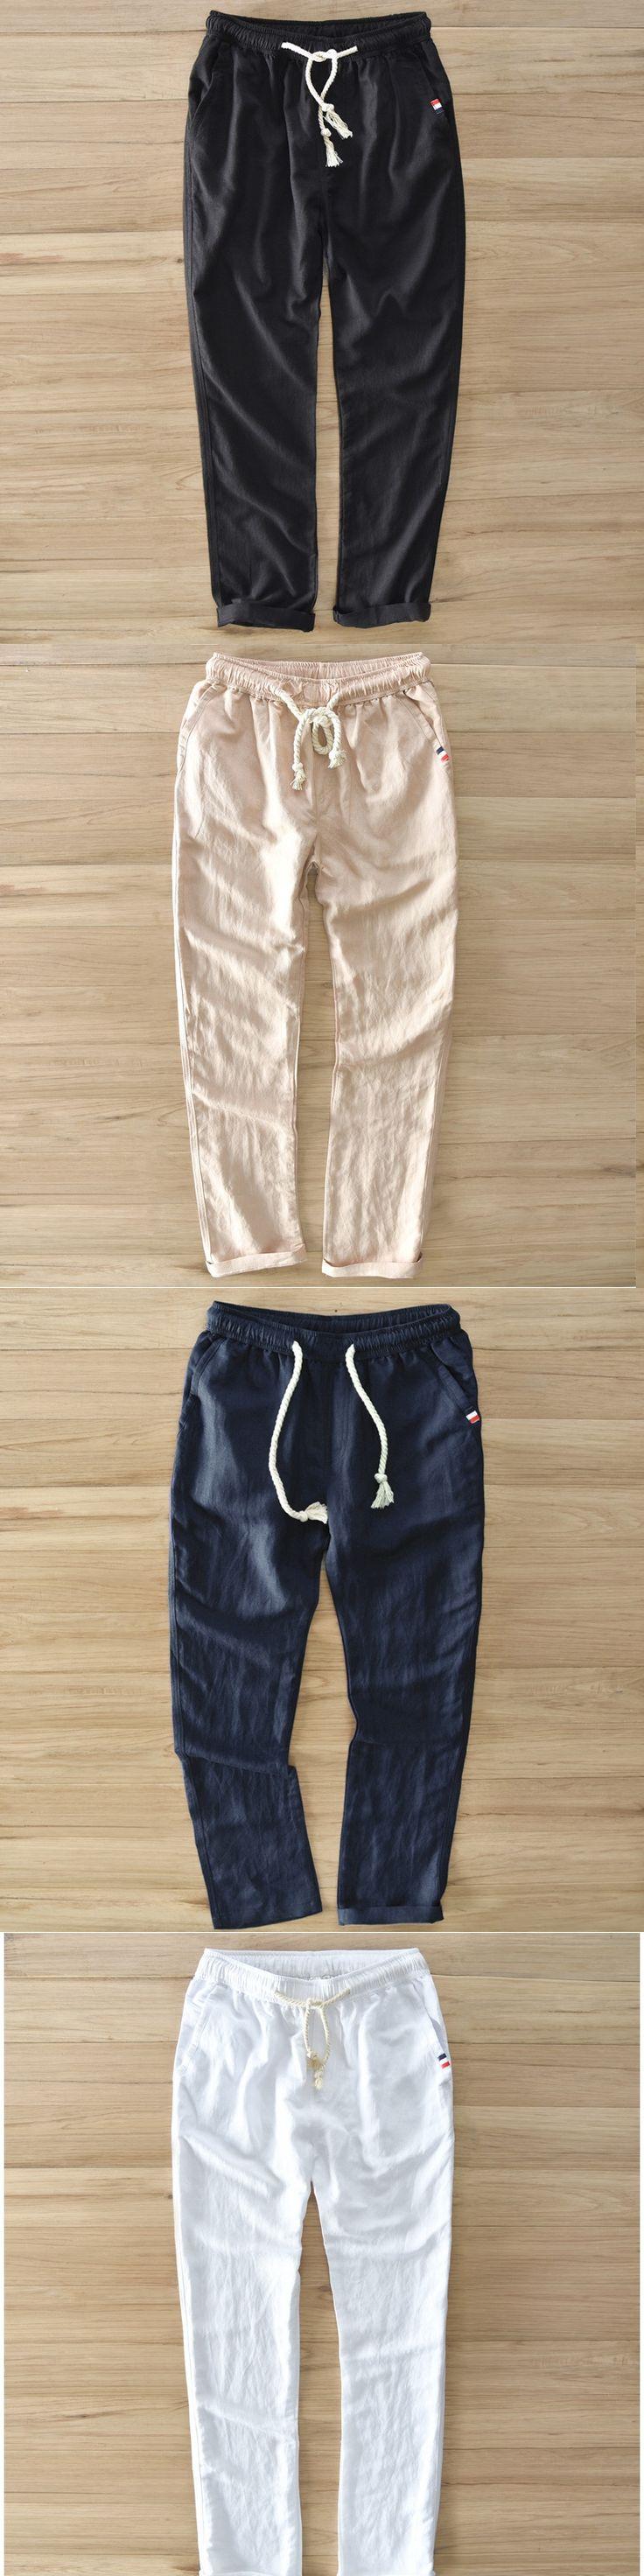 2017 Men Linen Casual Pants Stretch Flax Cotton Trousers White Black Khaki Men's Straight Pants Y054